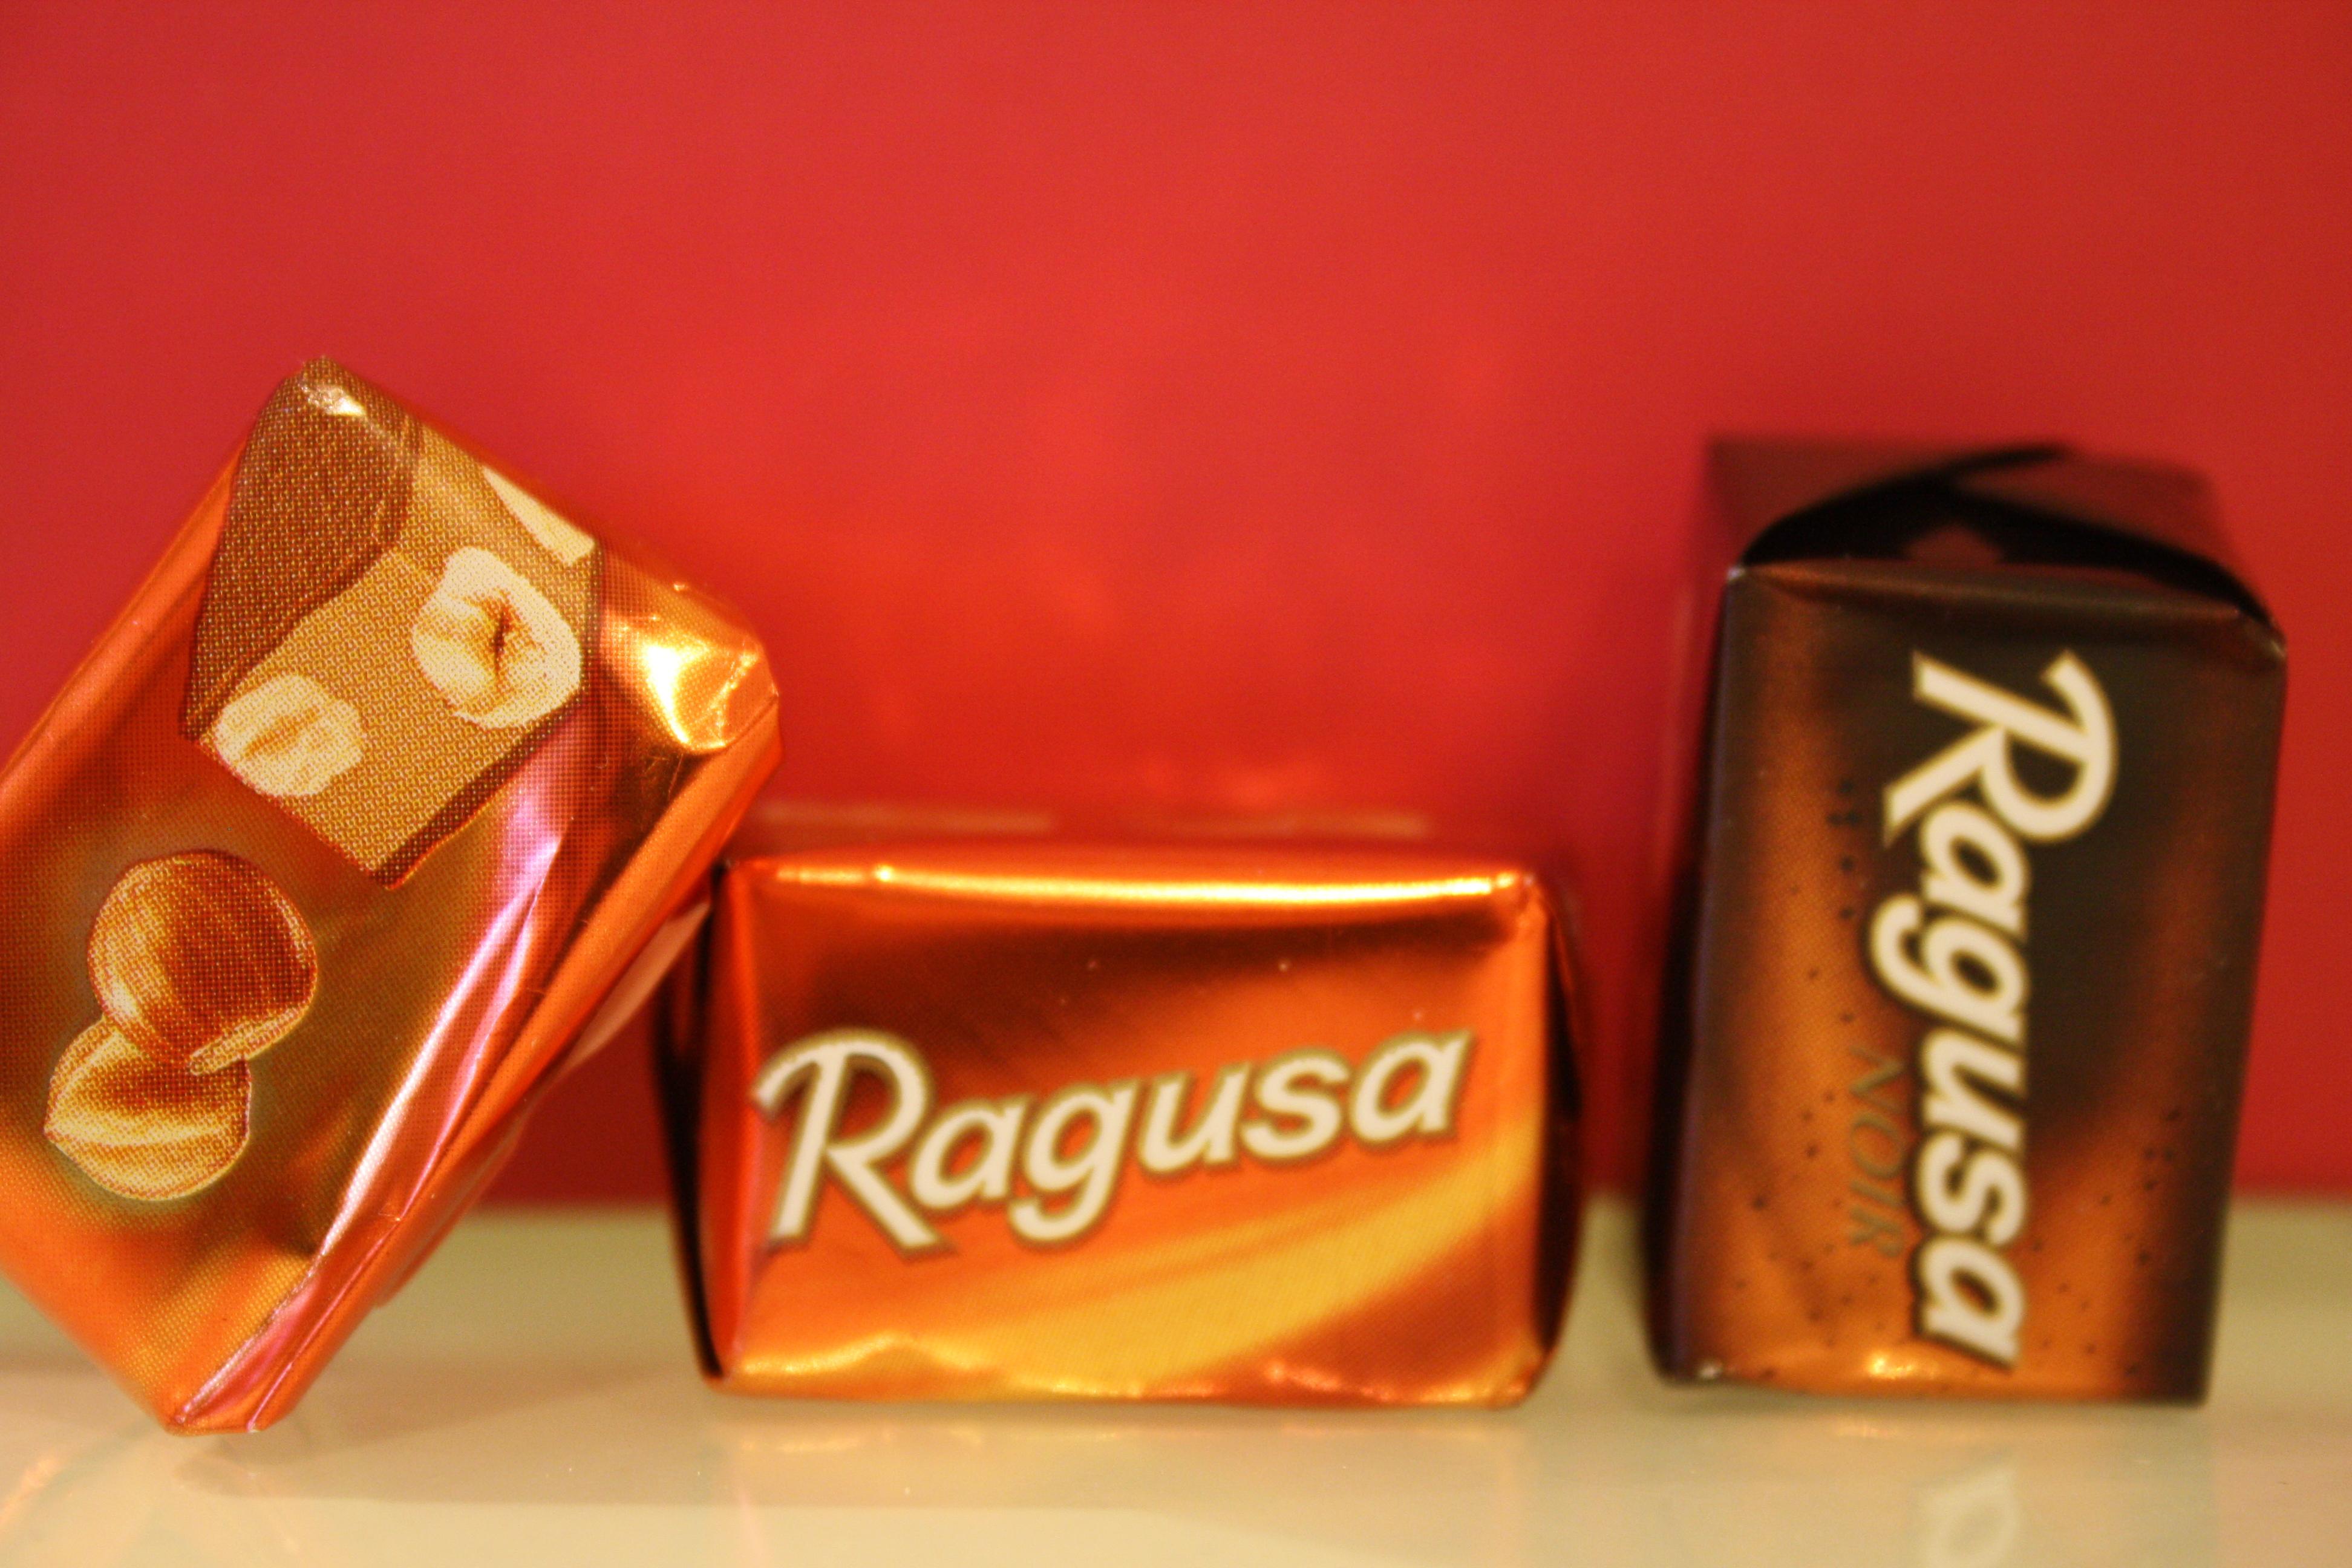 Chocolats Ragusa